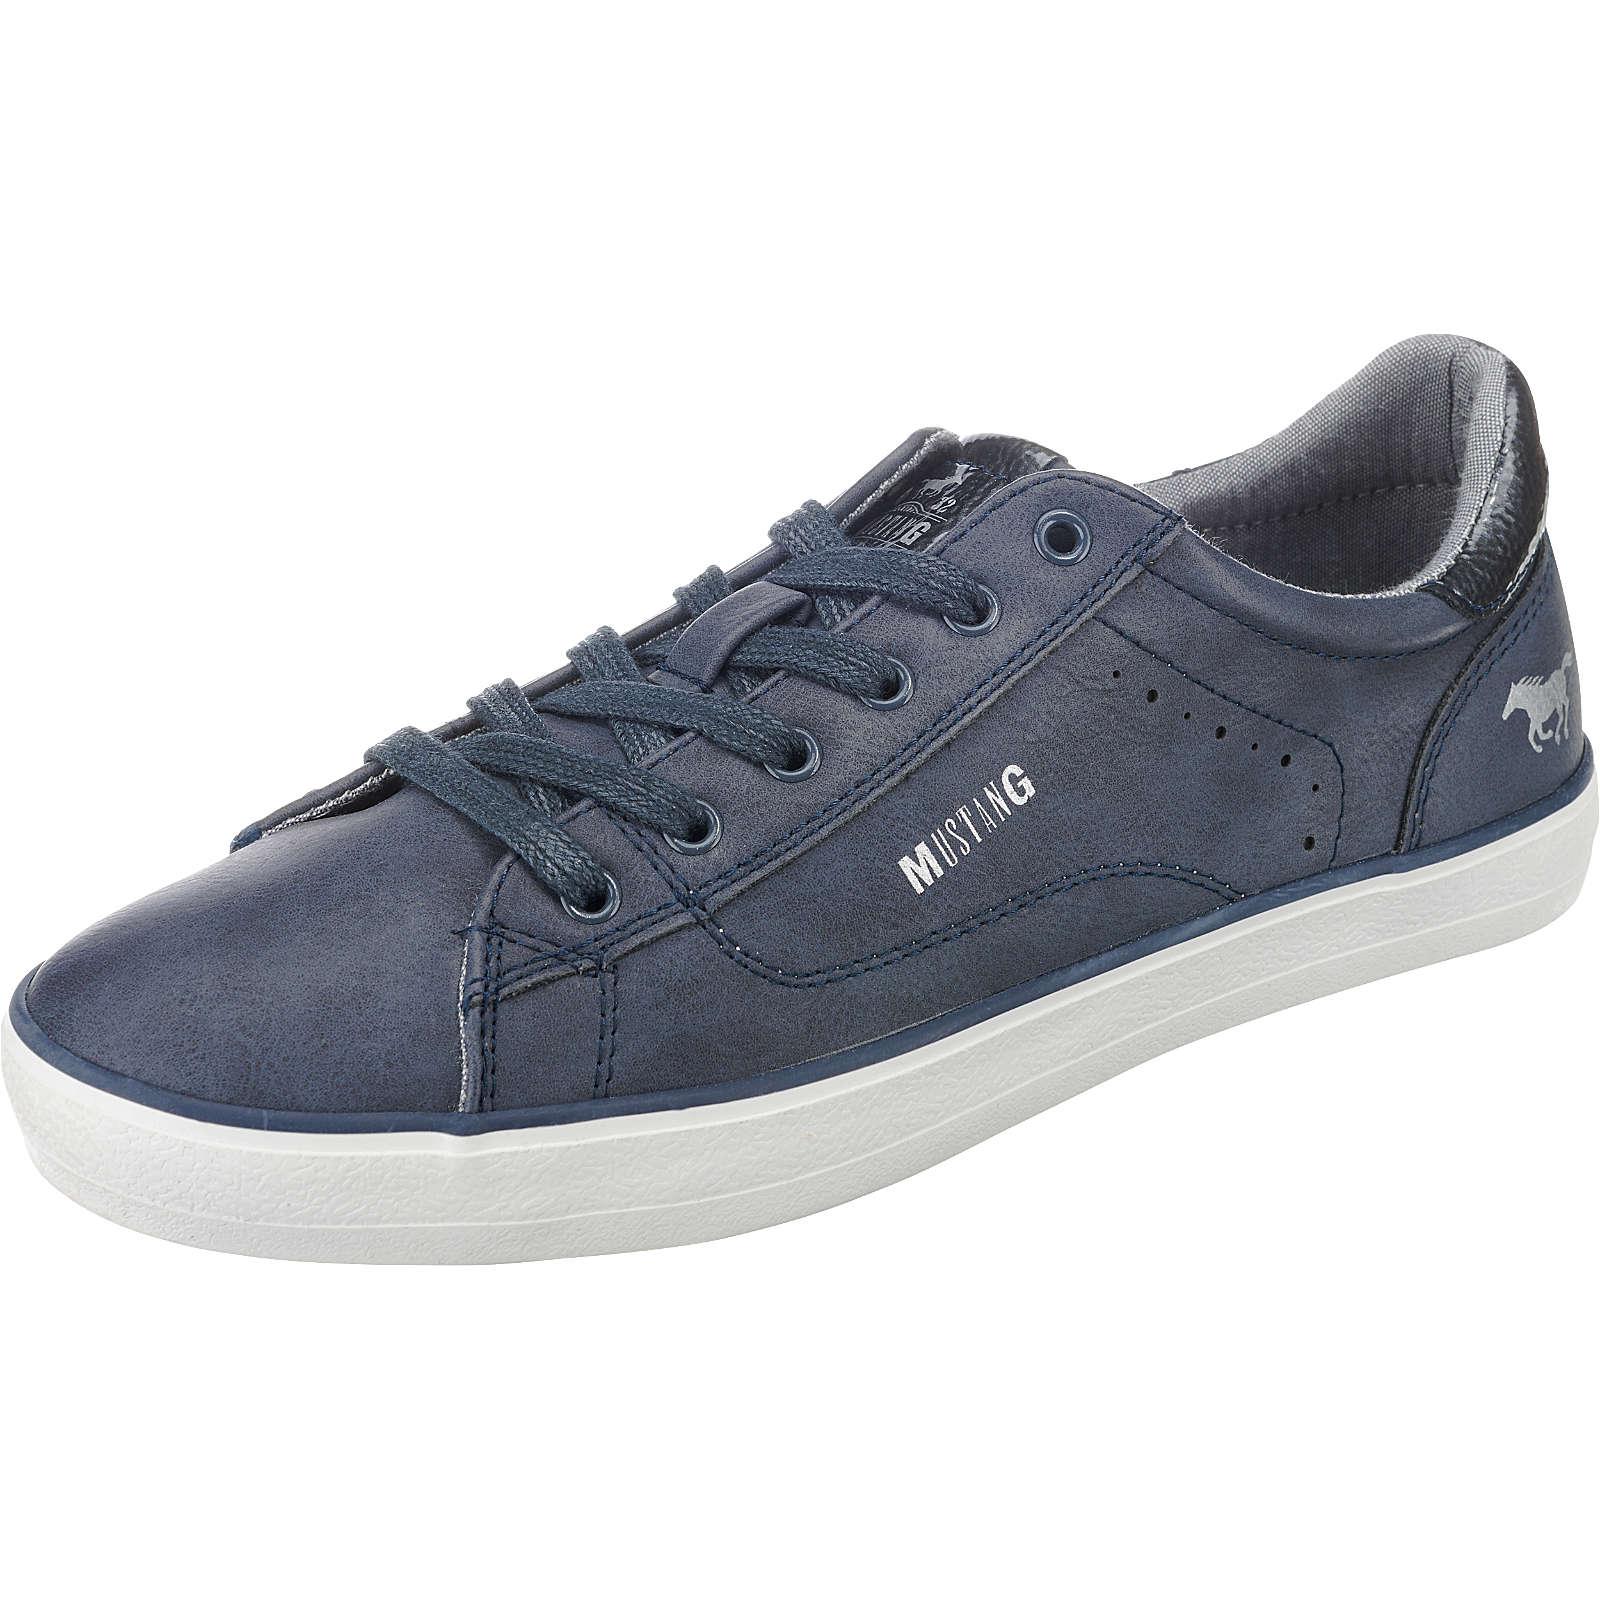 MUSTANG Sneakers Low blau Damen Gr. 39